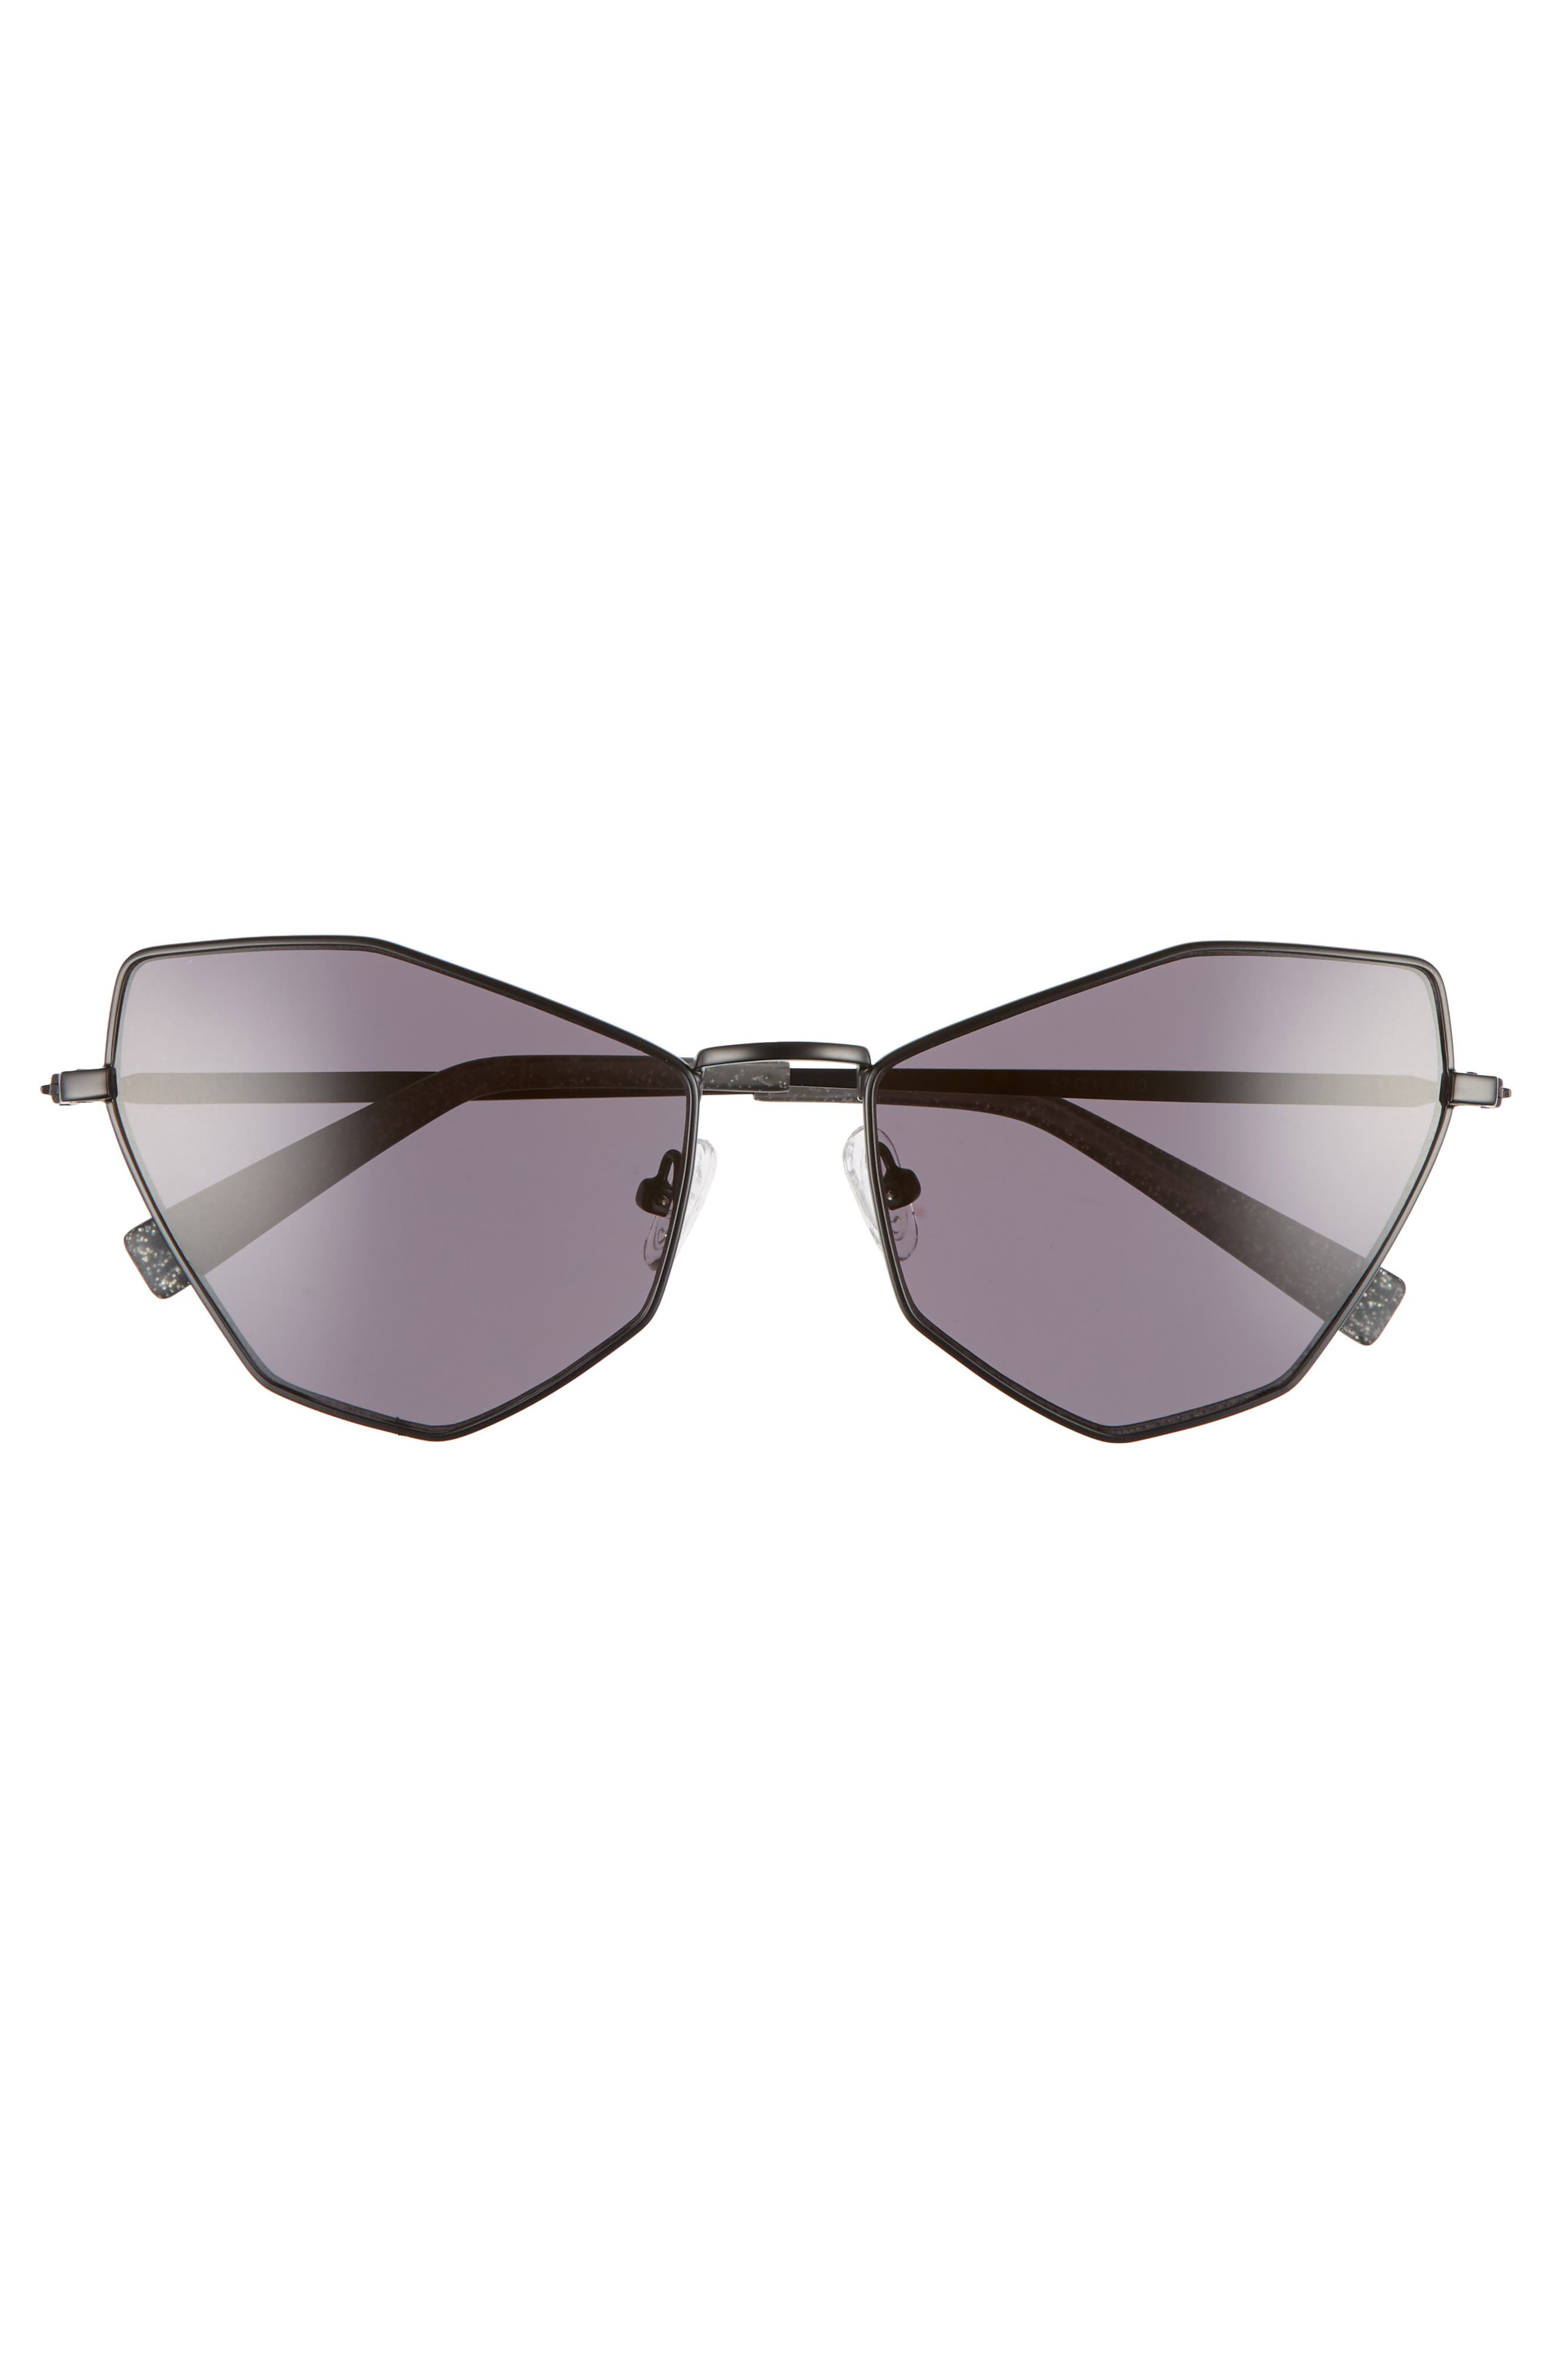 Liara 57mm Cat Eye Sunglasses,                             Alternate thumbnail 3, color,                             BLACK METAL/ SOLID SMOKE